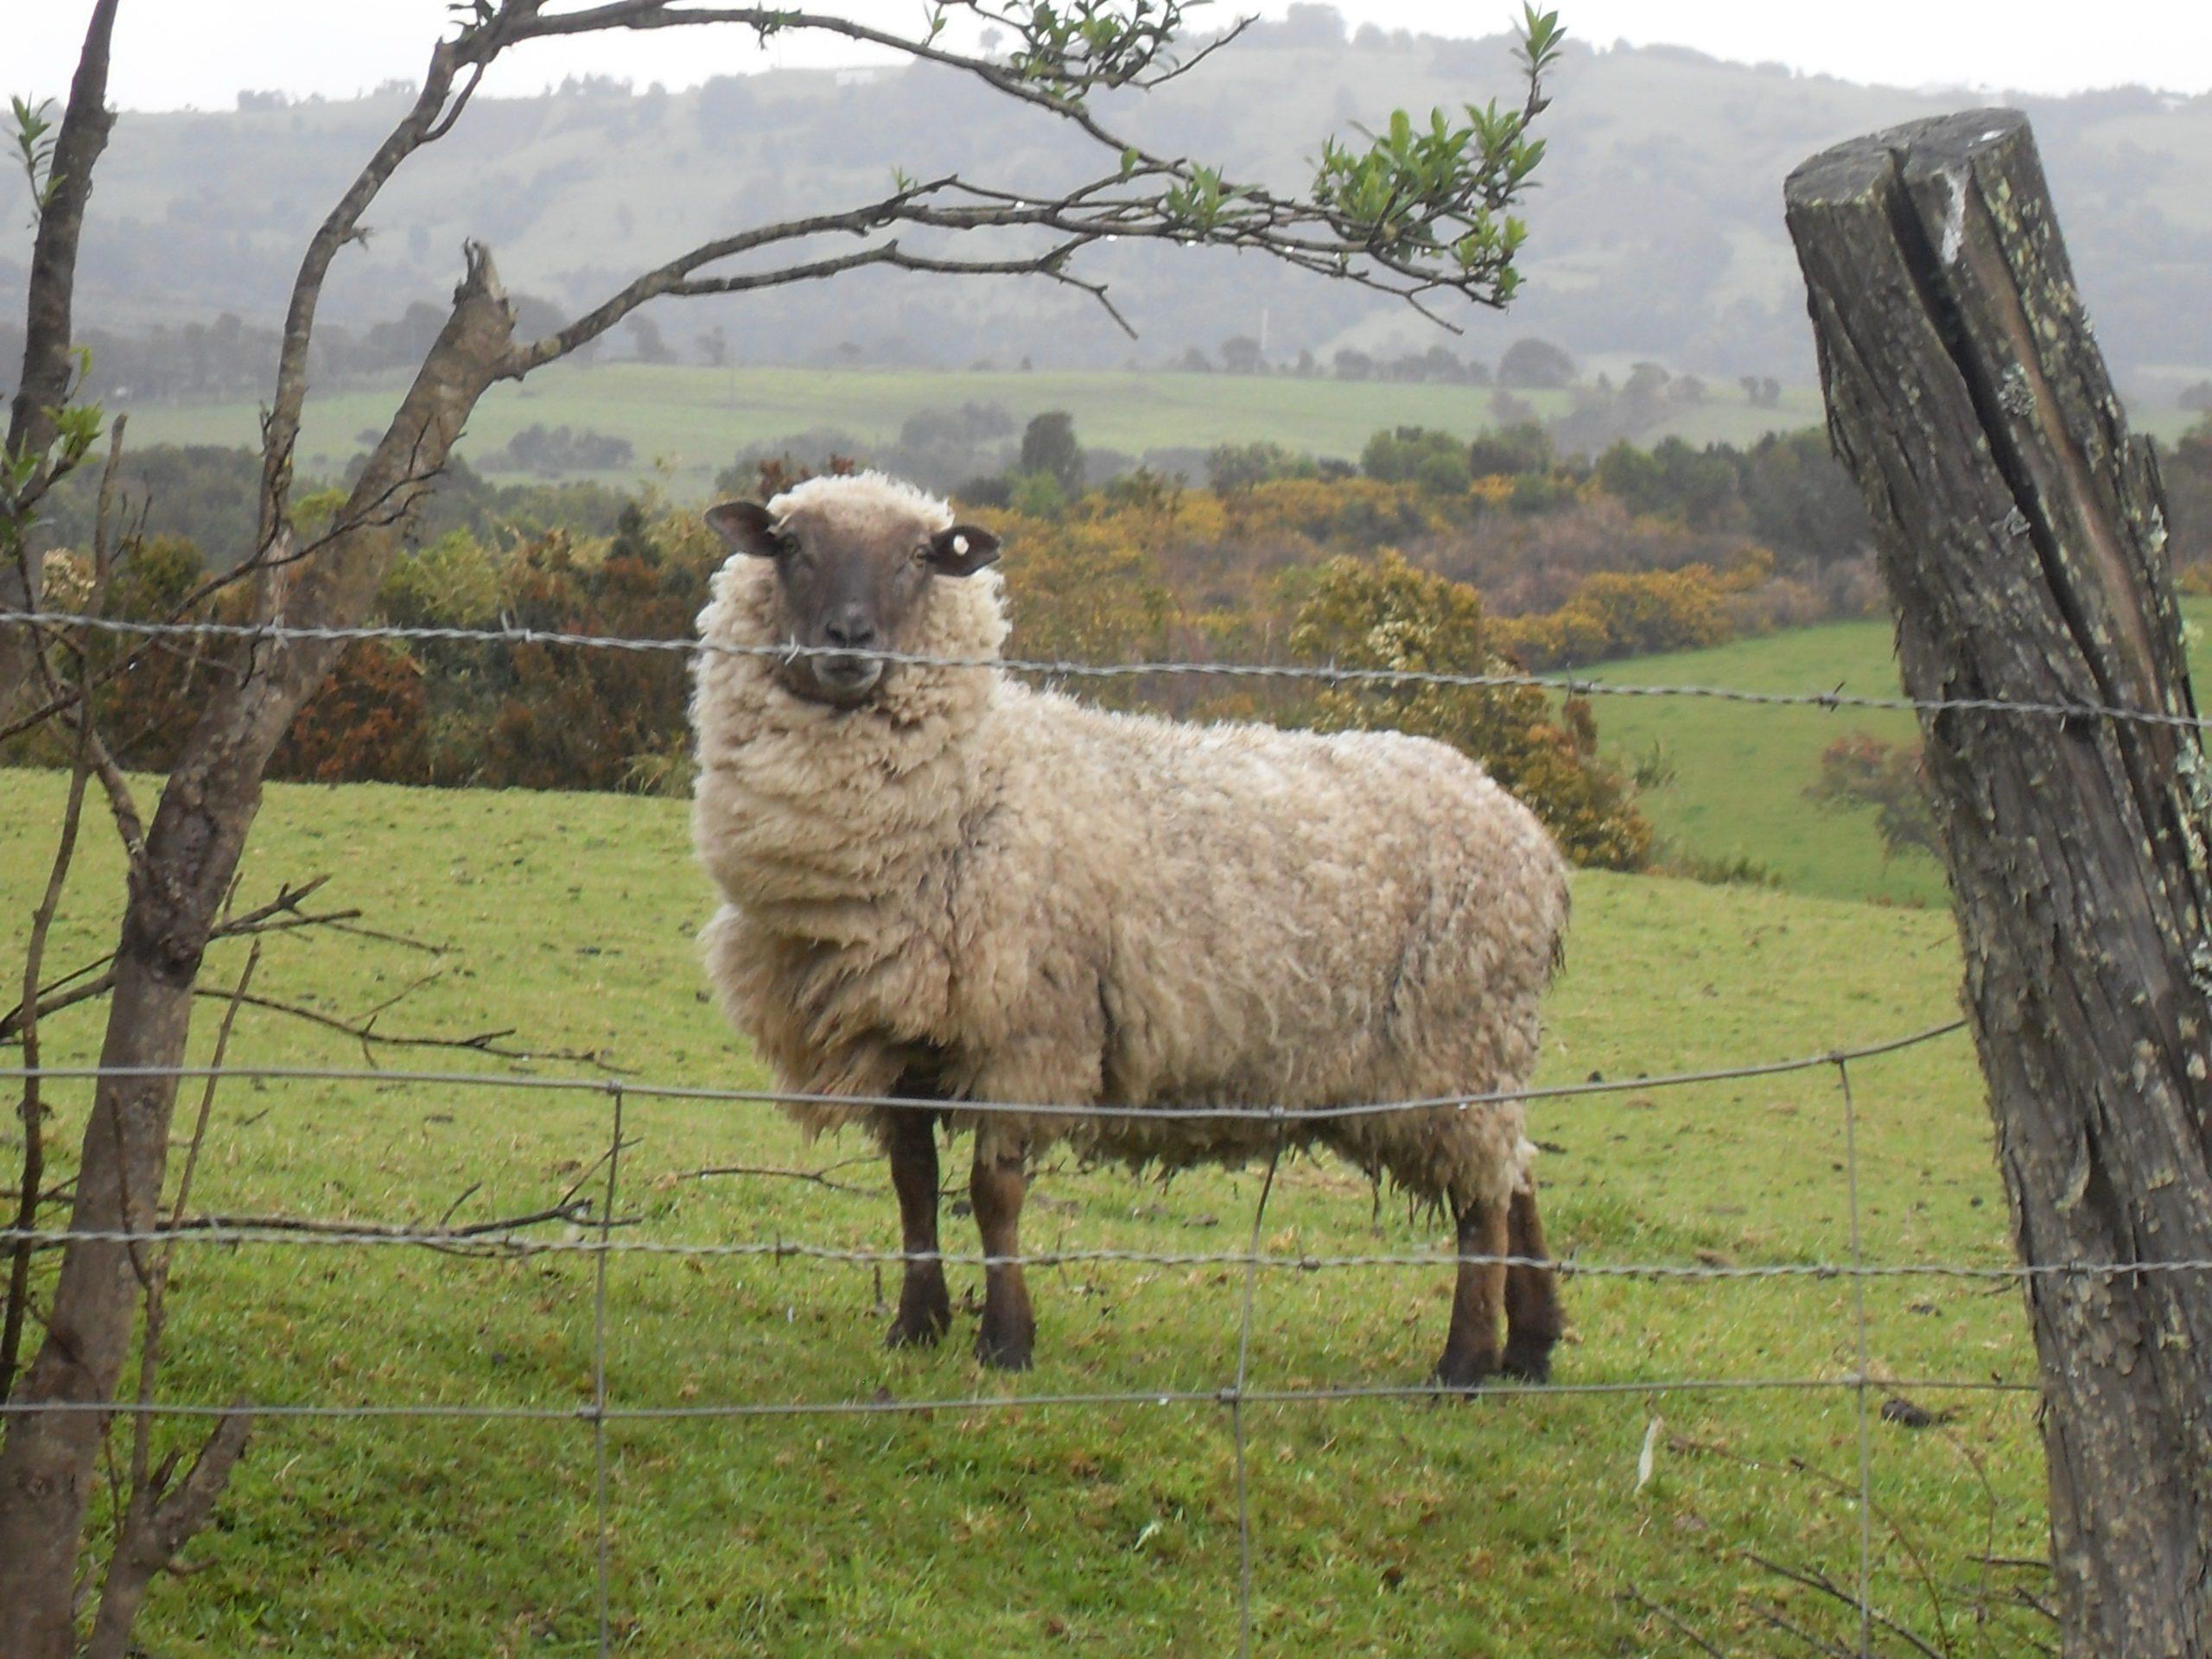 sheep on farmland in Chiloe